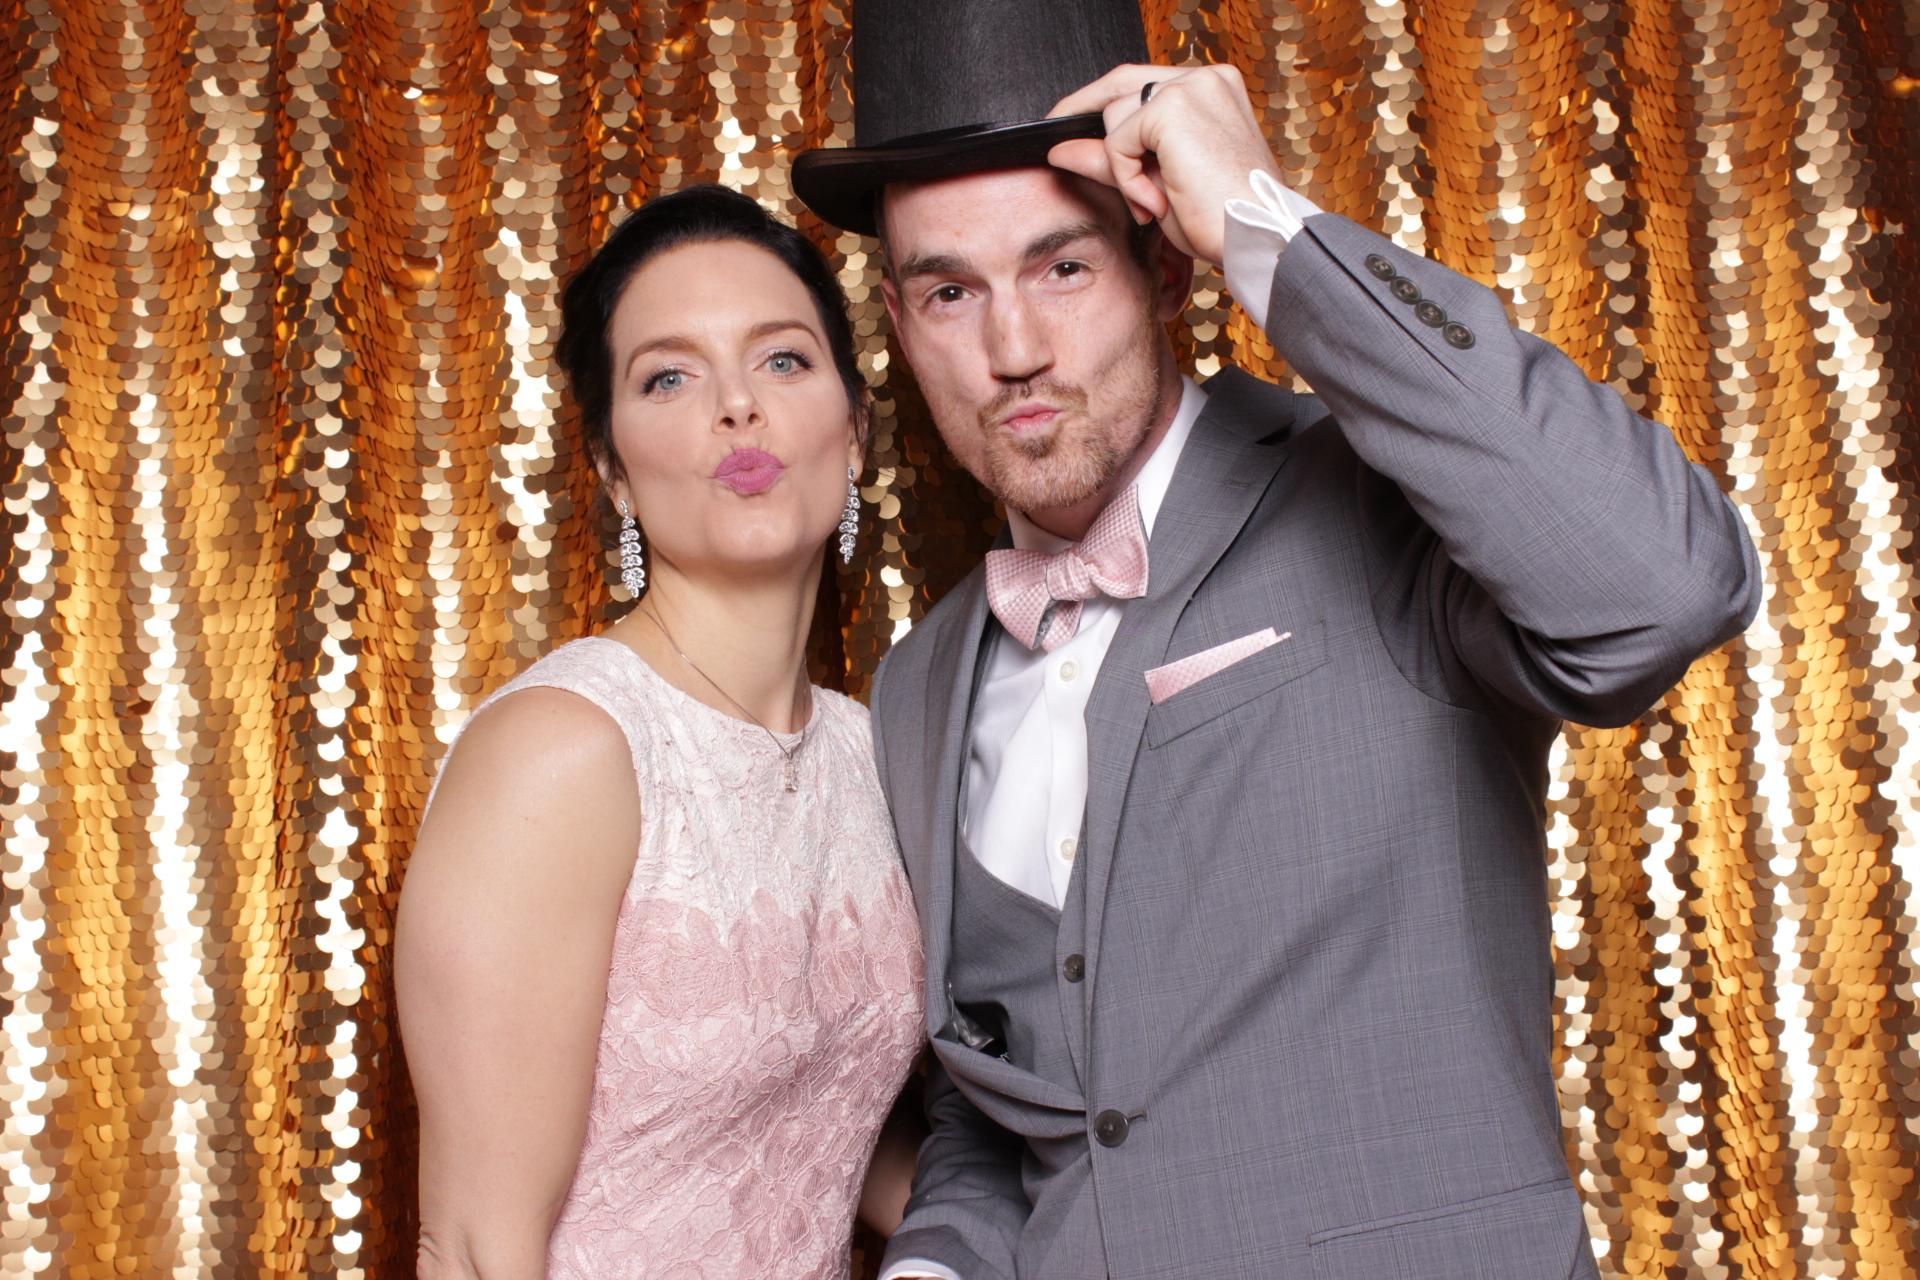 LYLE + DESIREE WEDDING | HOT PINK PHOTO BOOTH